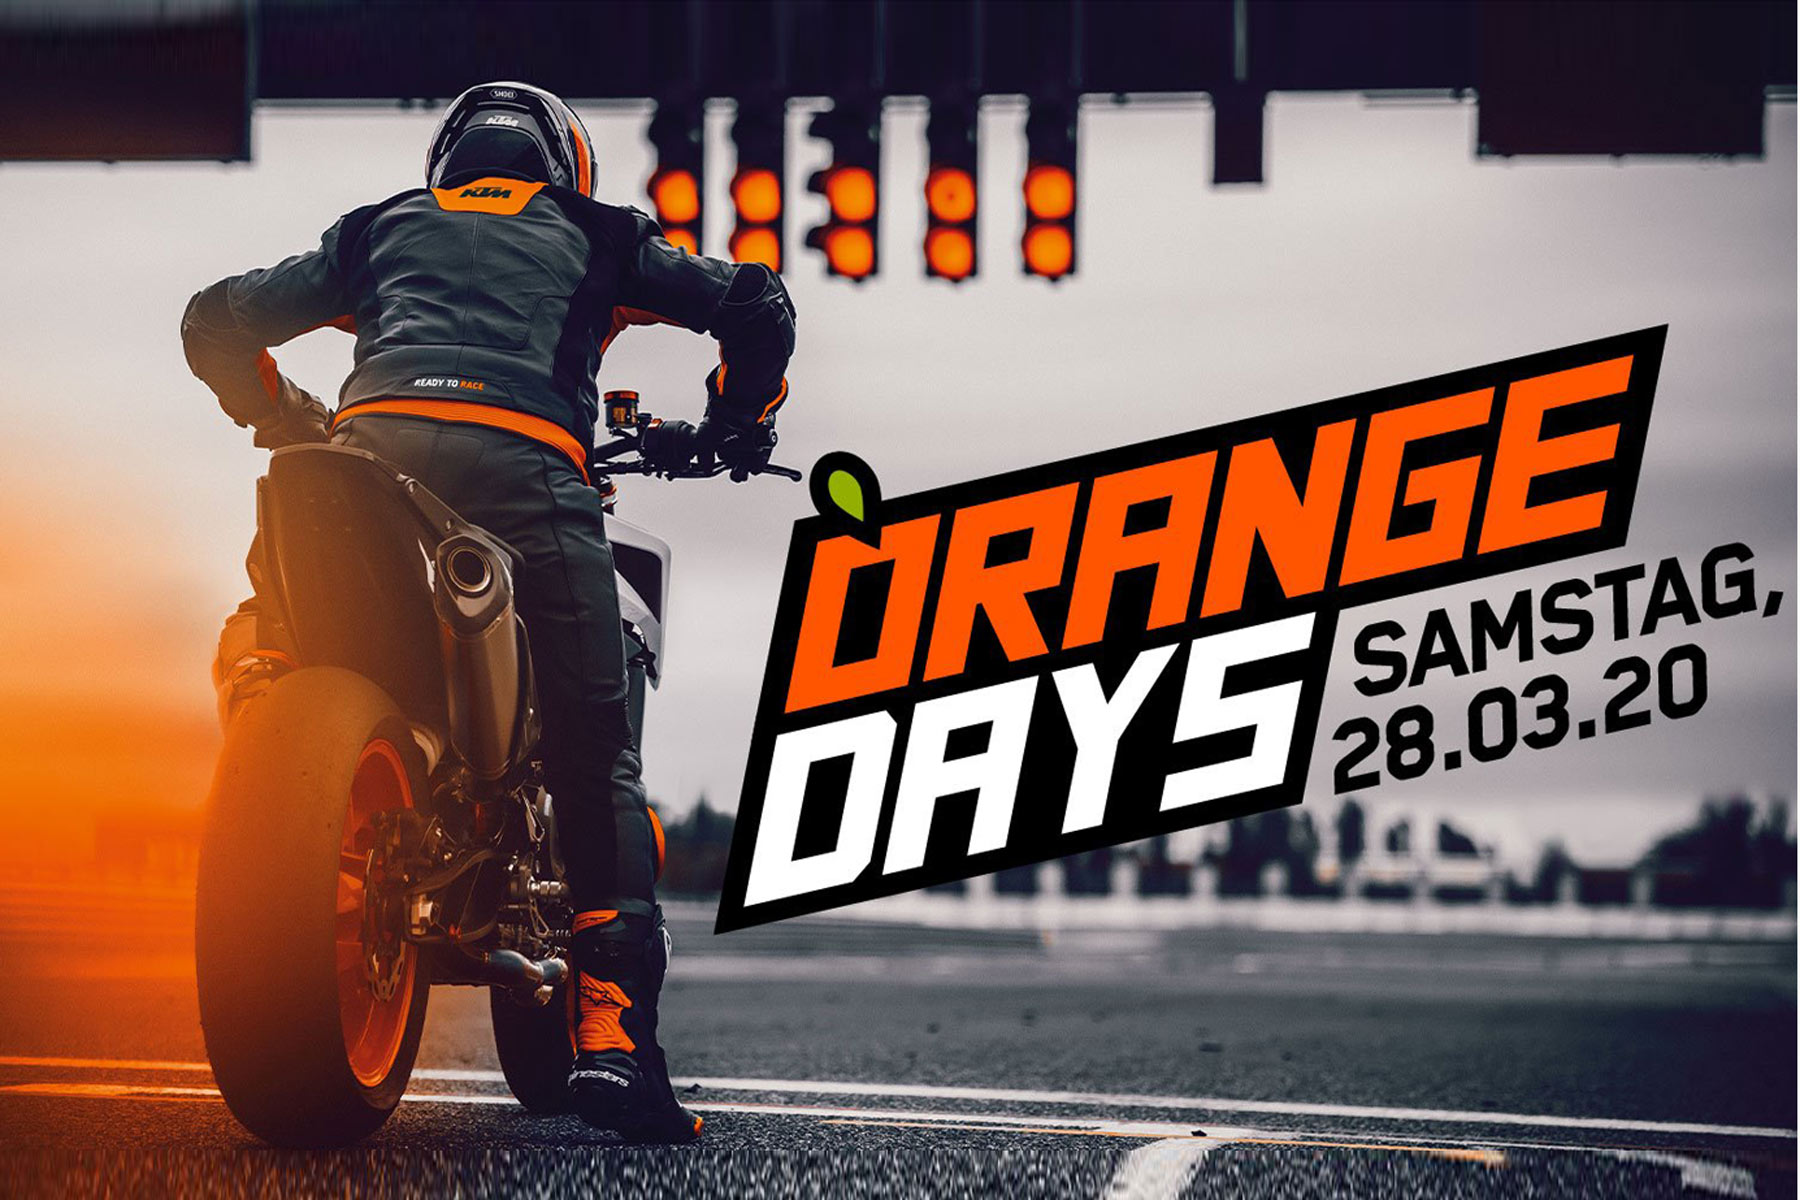 KTM Vertragshändler Motorradsport Schmitt - KTM ORANGE DAYS 2020